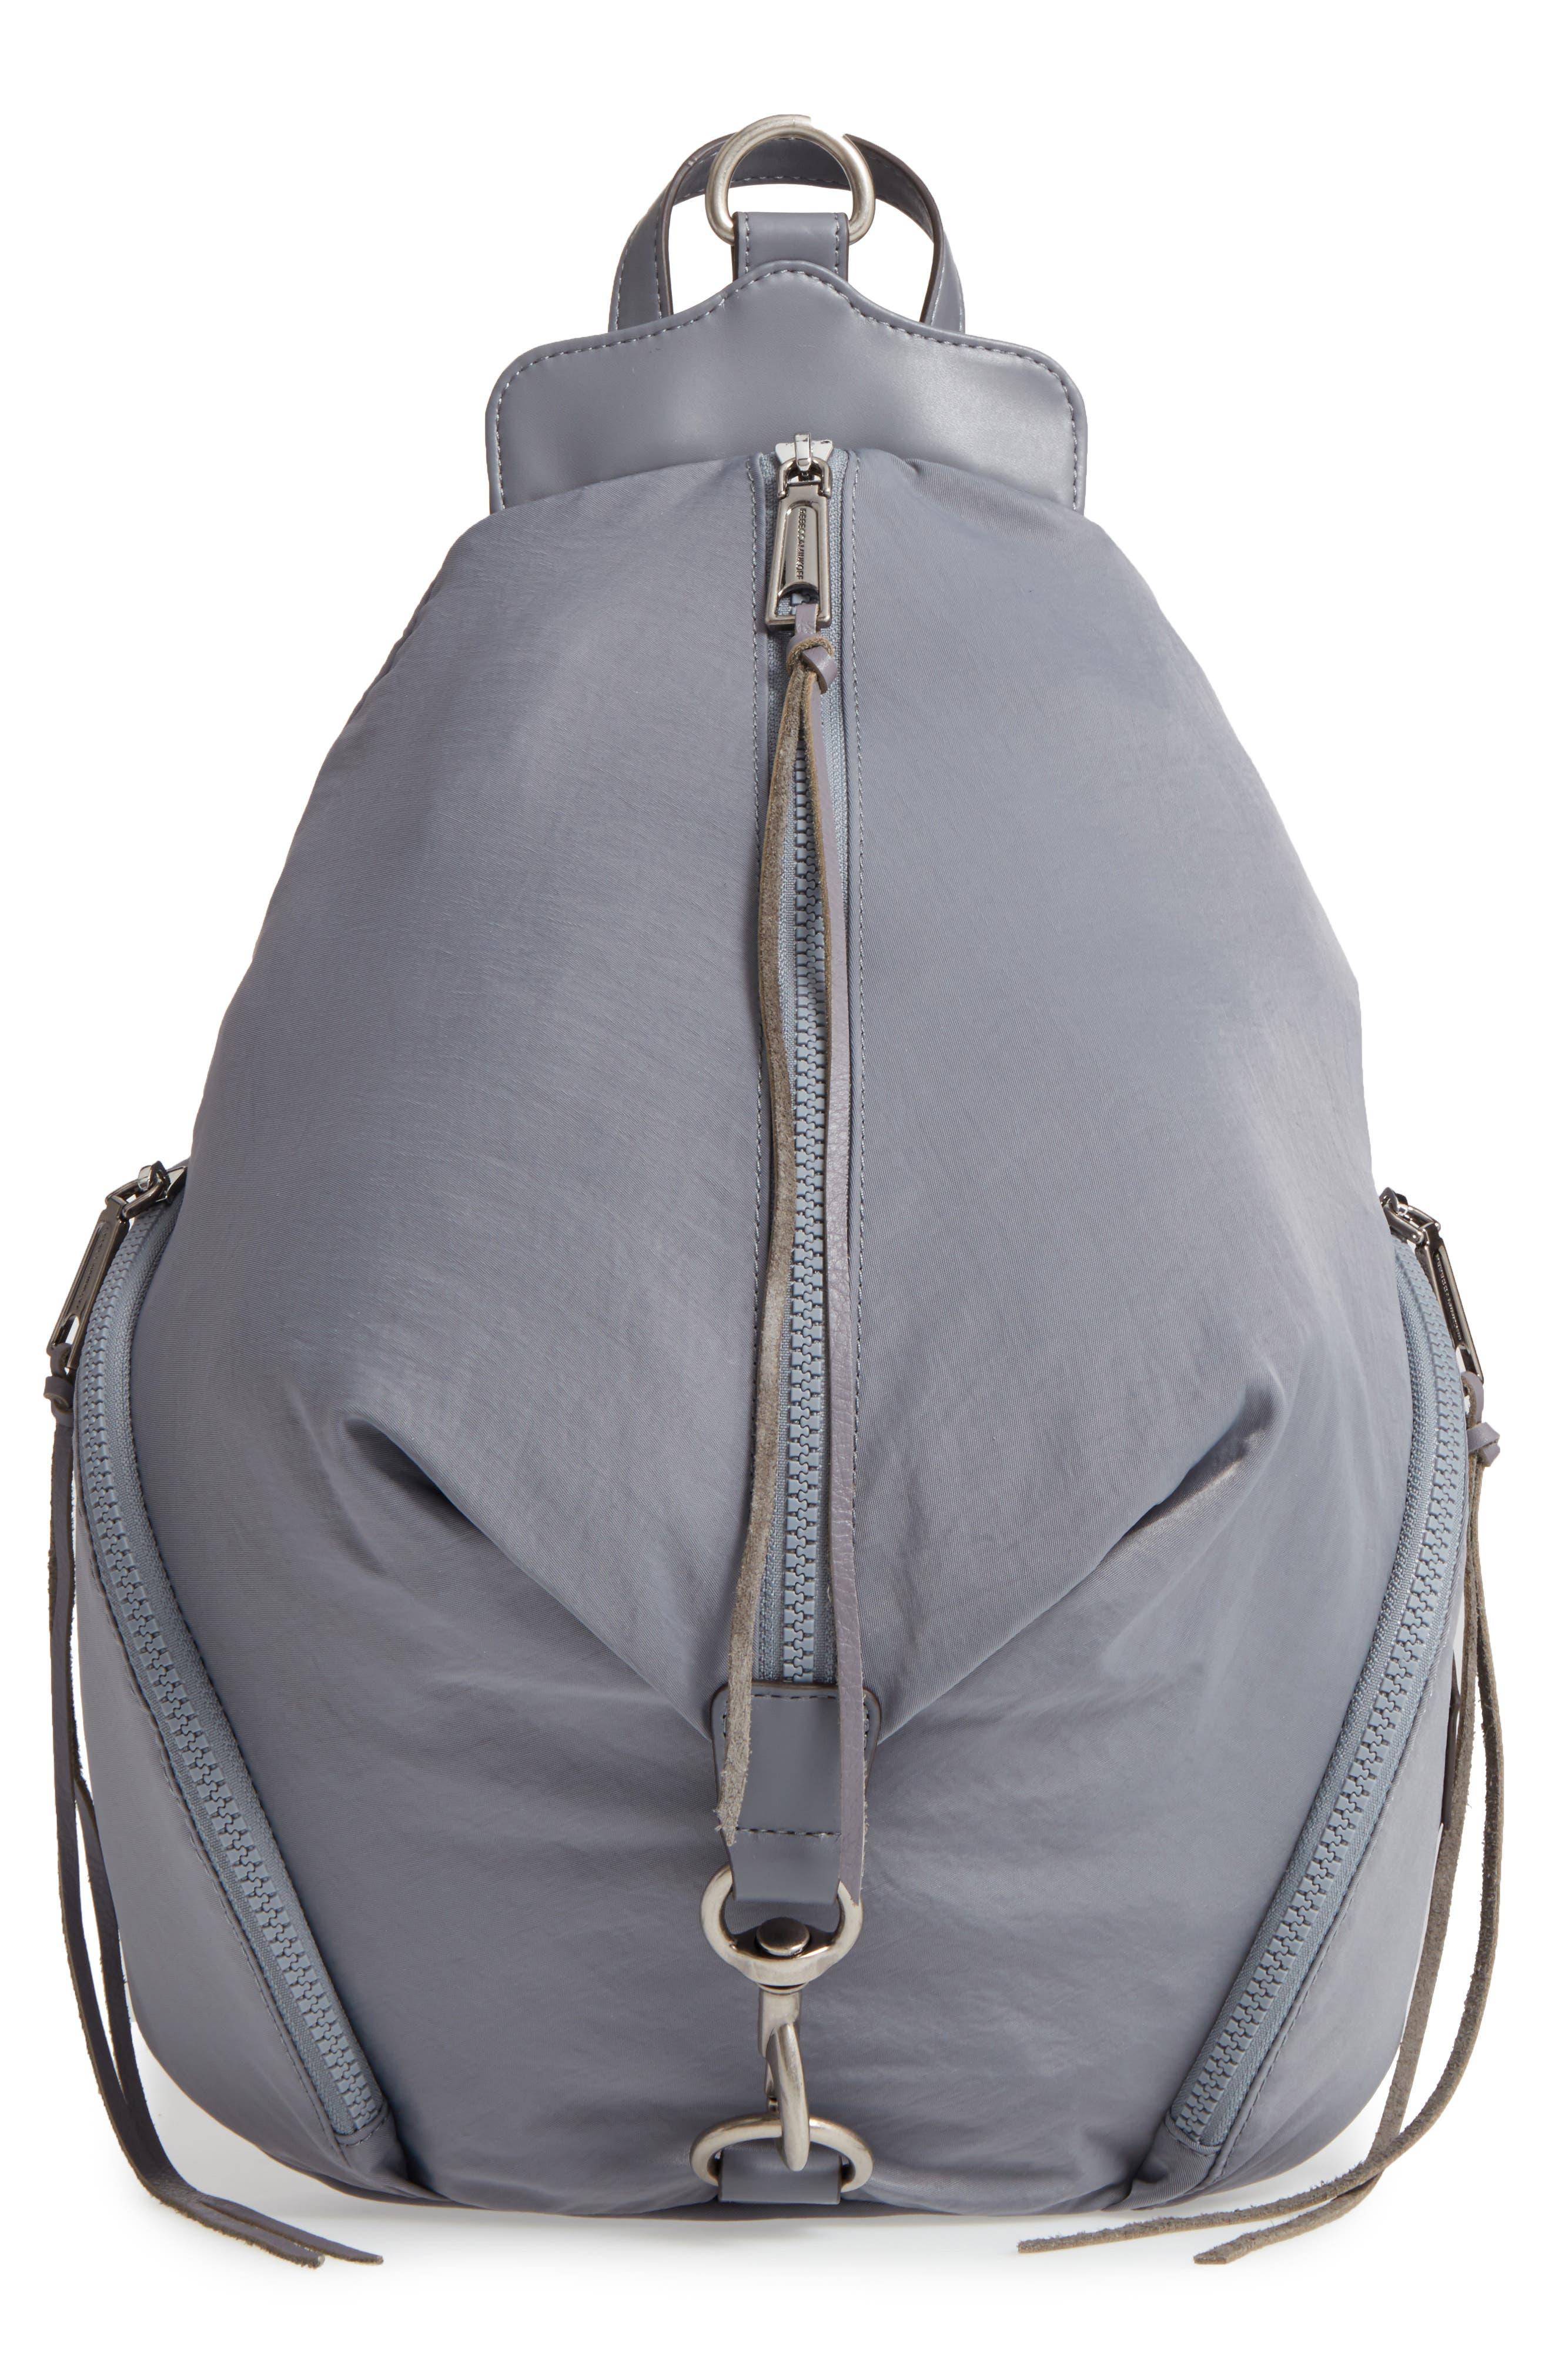 Julian Nylon Backpack,                             Main thumbnail 1, color,                             GREY